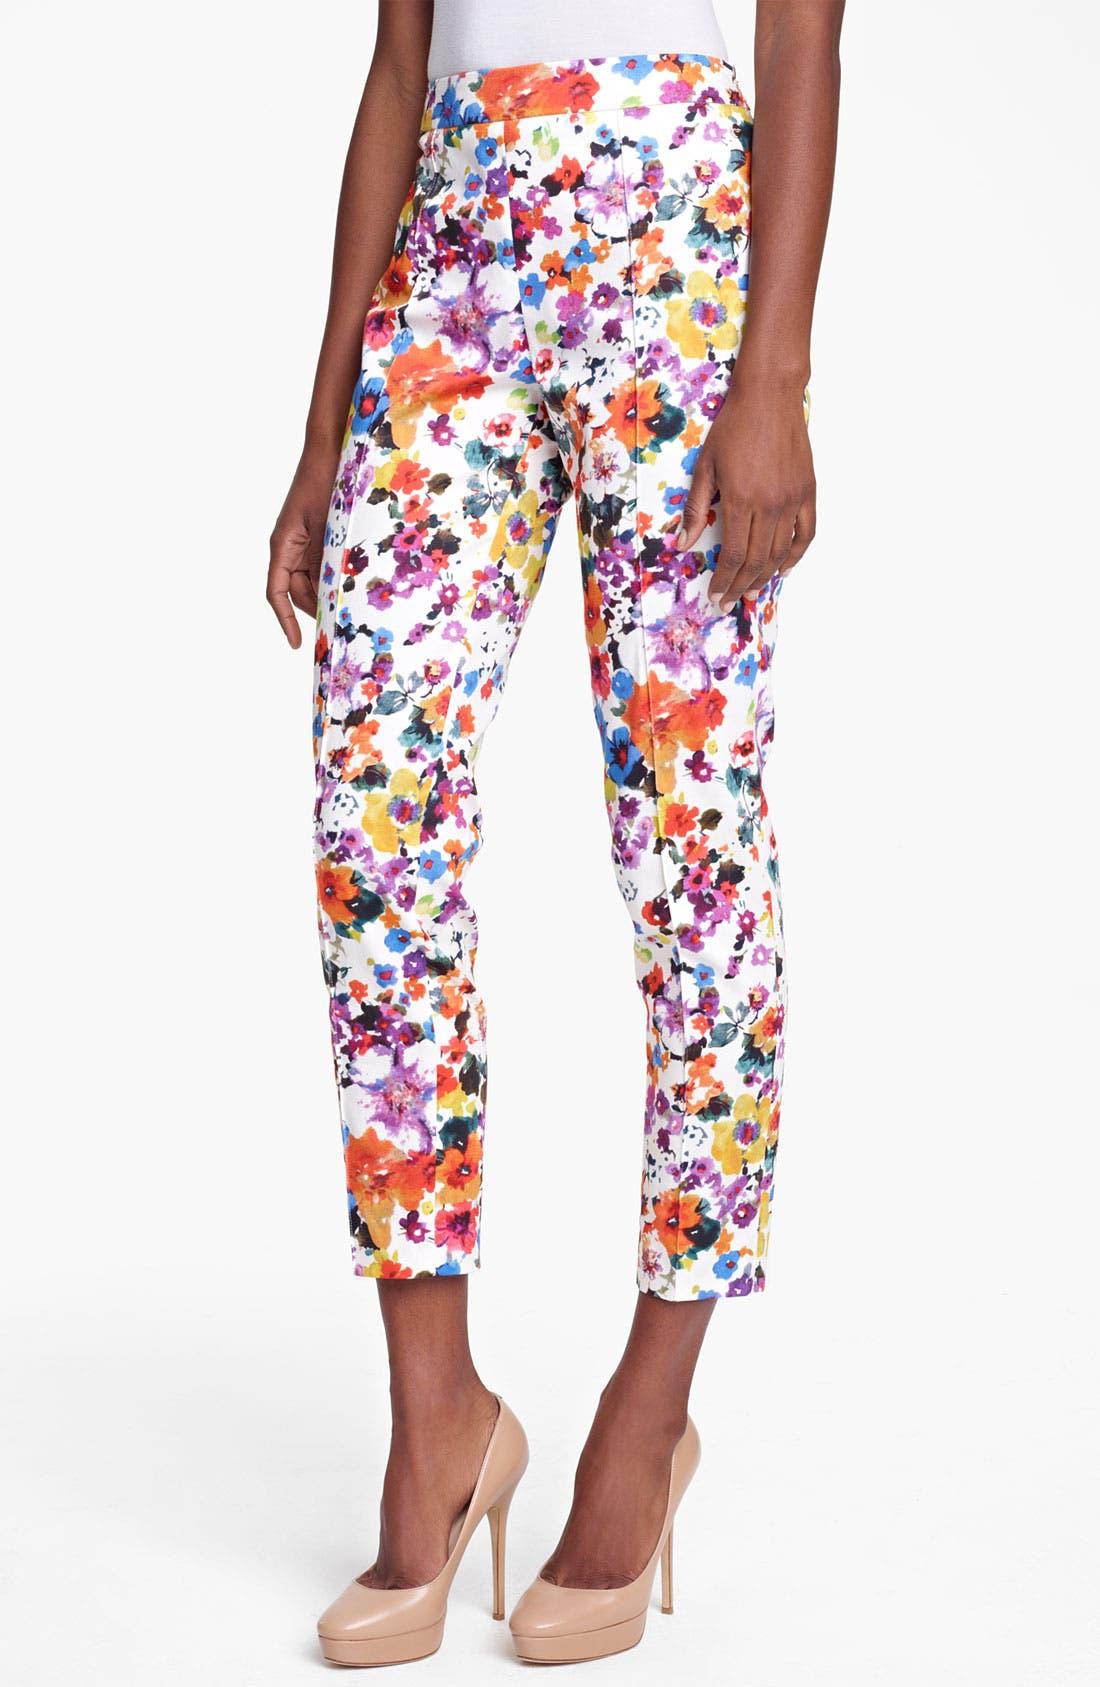 Alternate Image 1 Selected - Max Mara 'Friscia' Floral Print Stretch Cotton Crop Pants